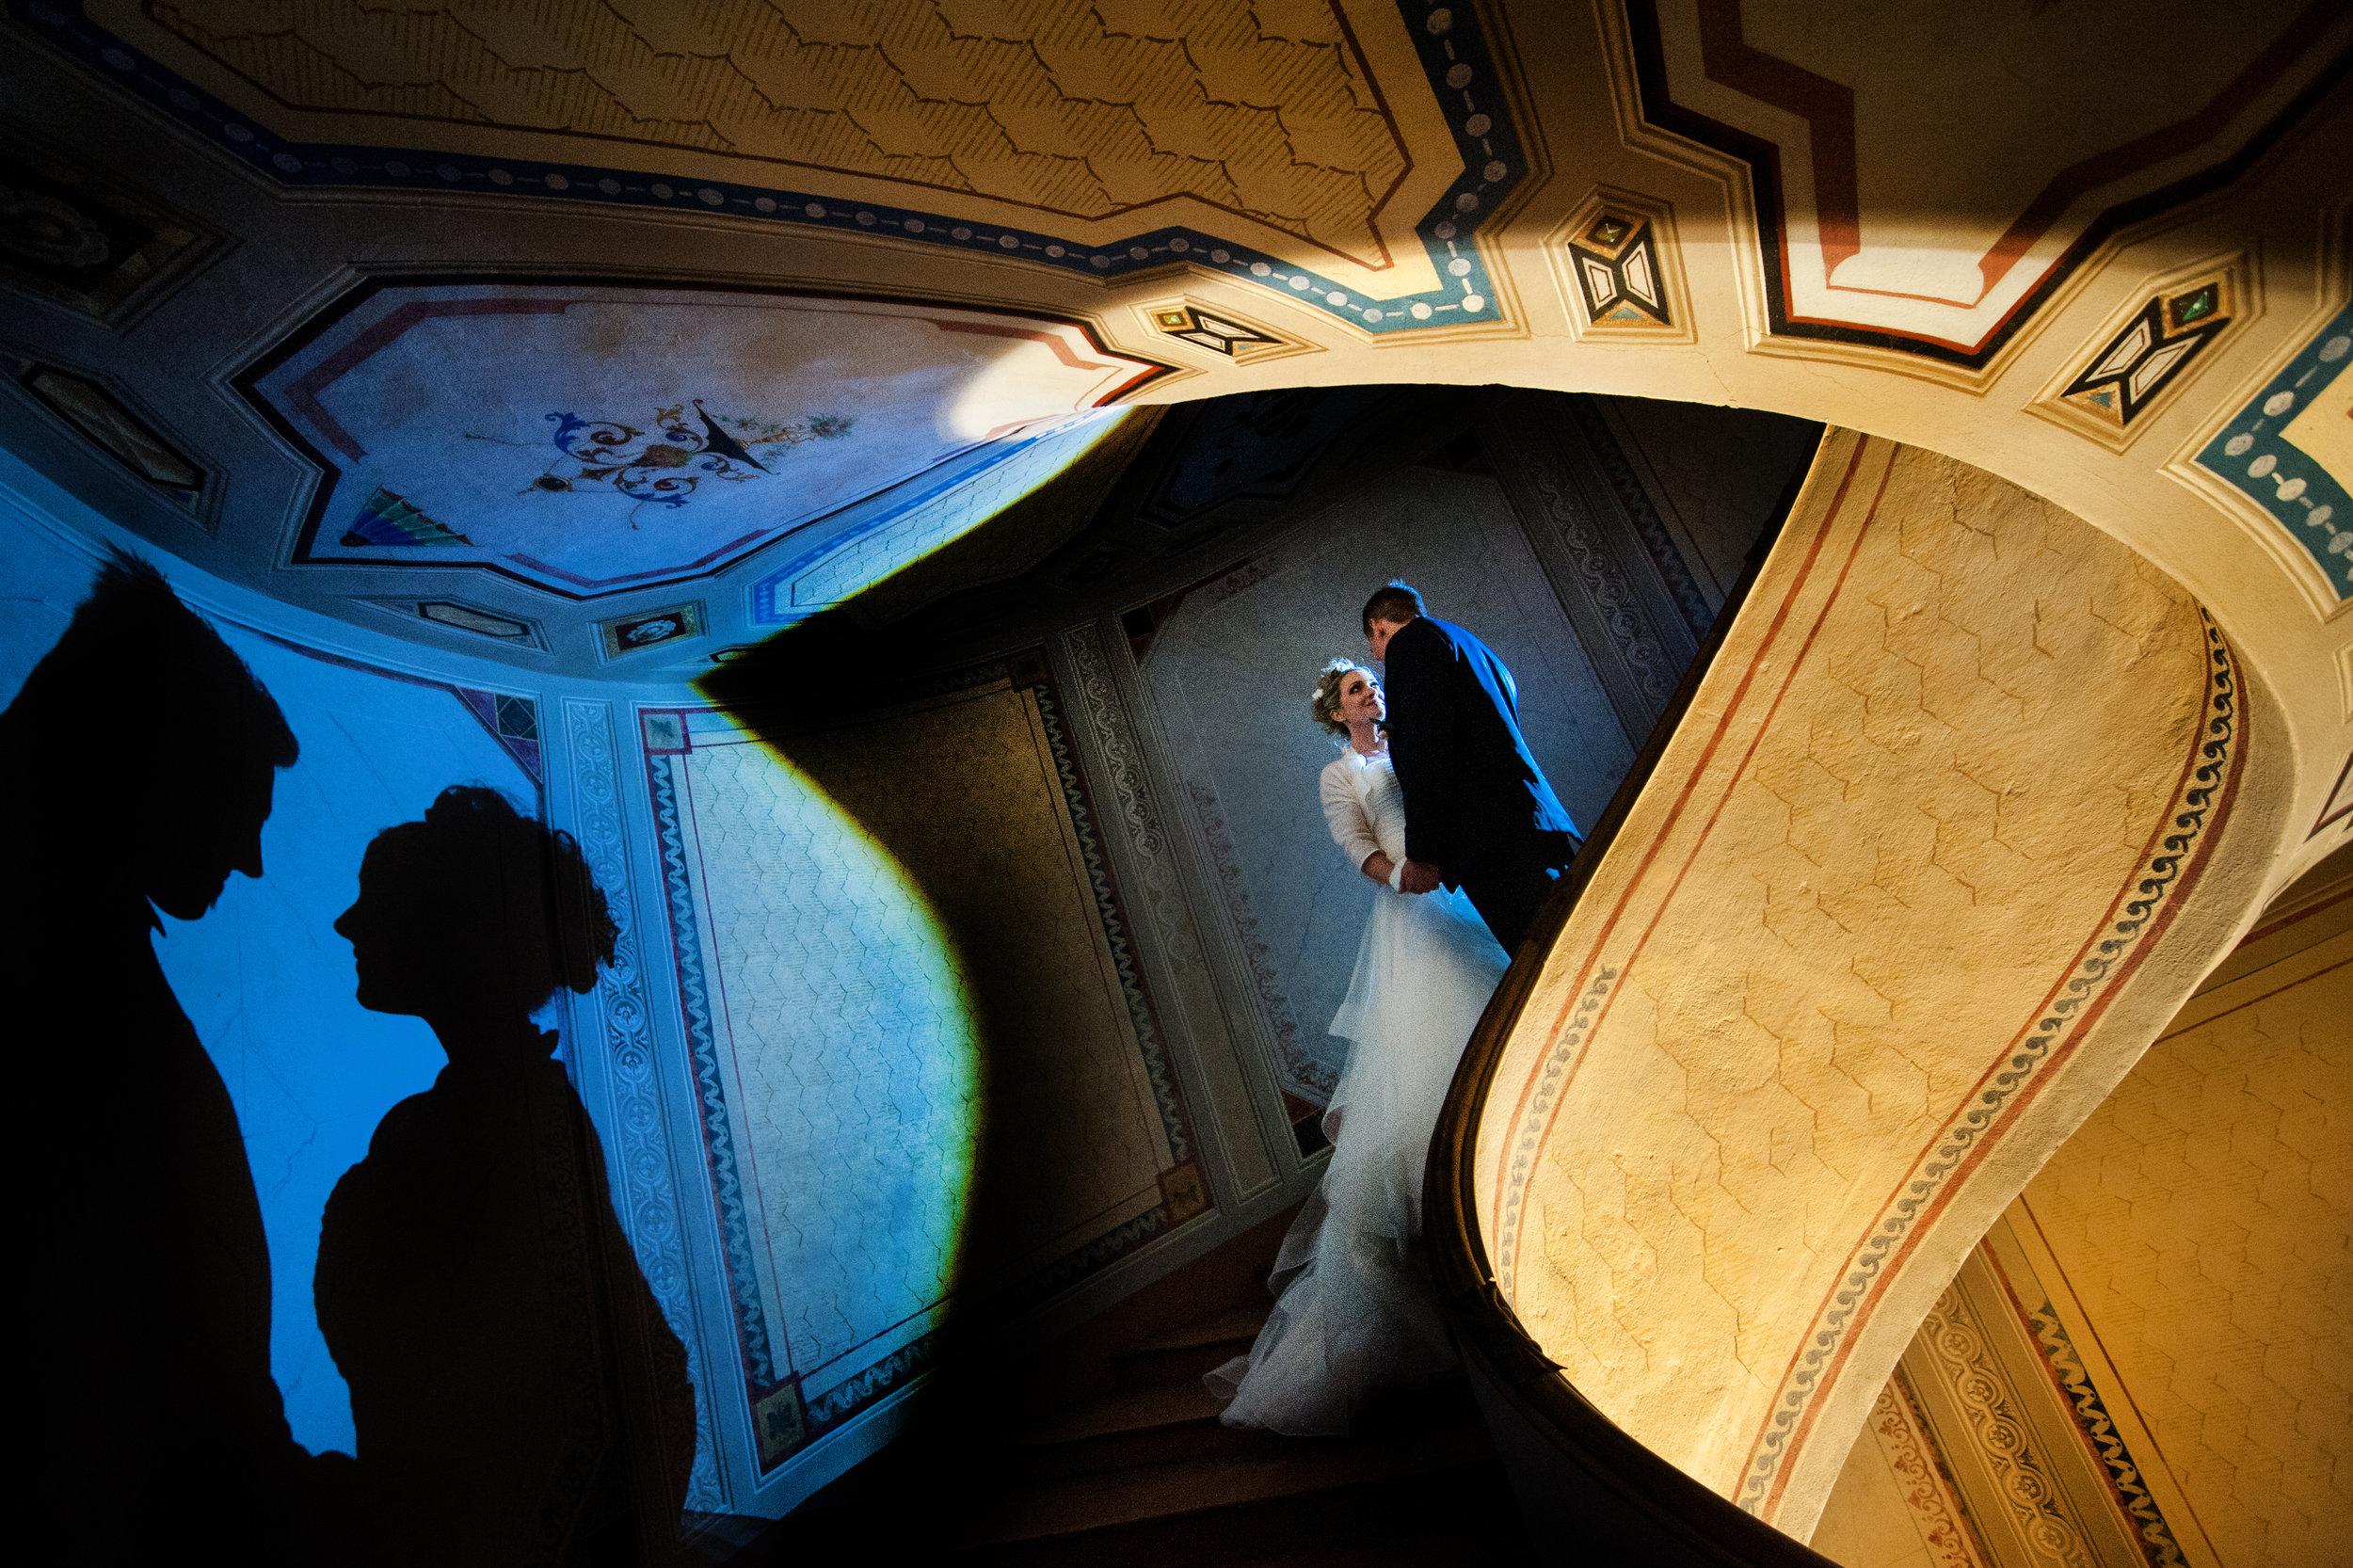 fotografo-di-matrimoni-stefano-torreggiani.jpg